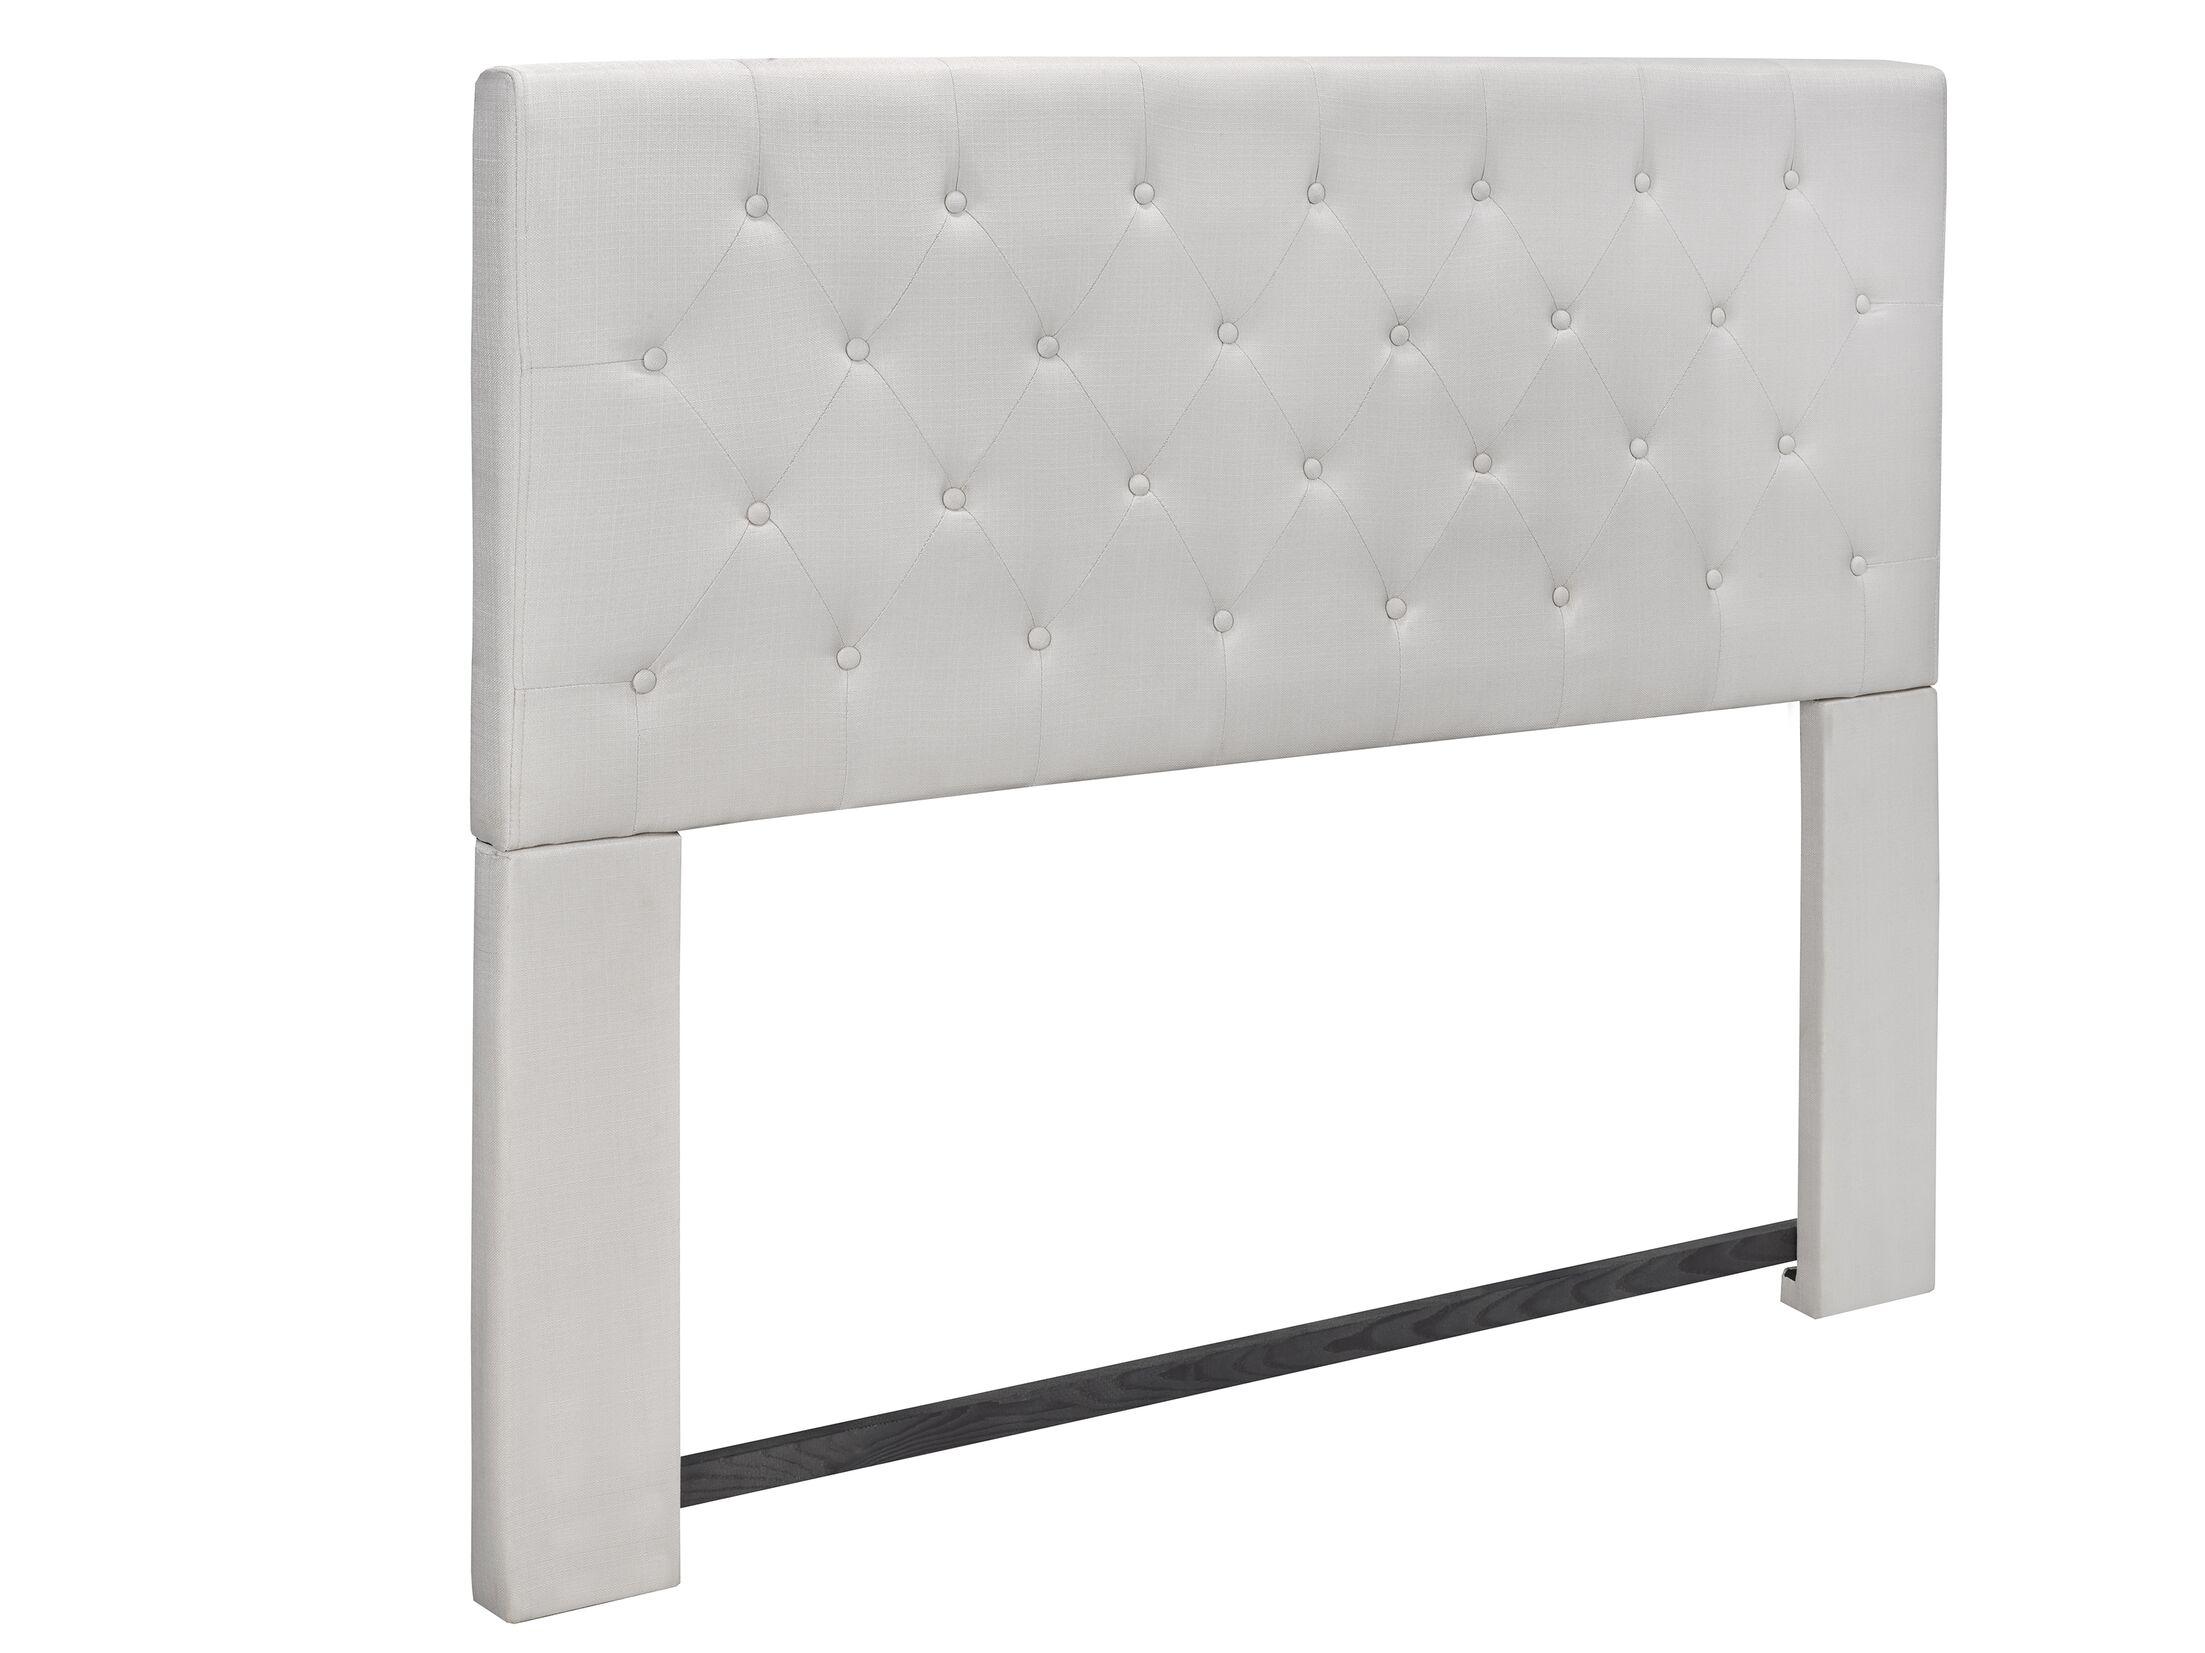 Tufted Upholstered Panel Headboard Upholstery: Beige